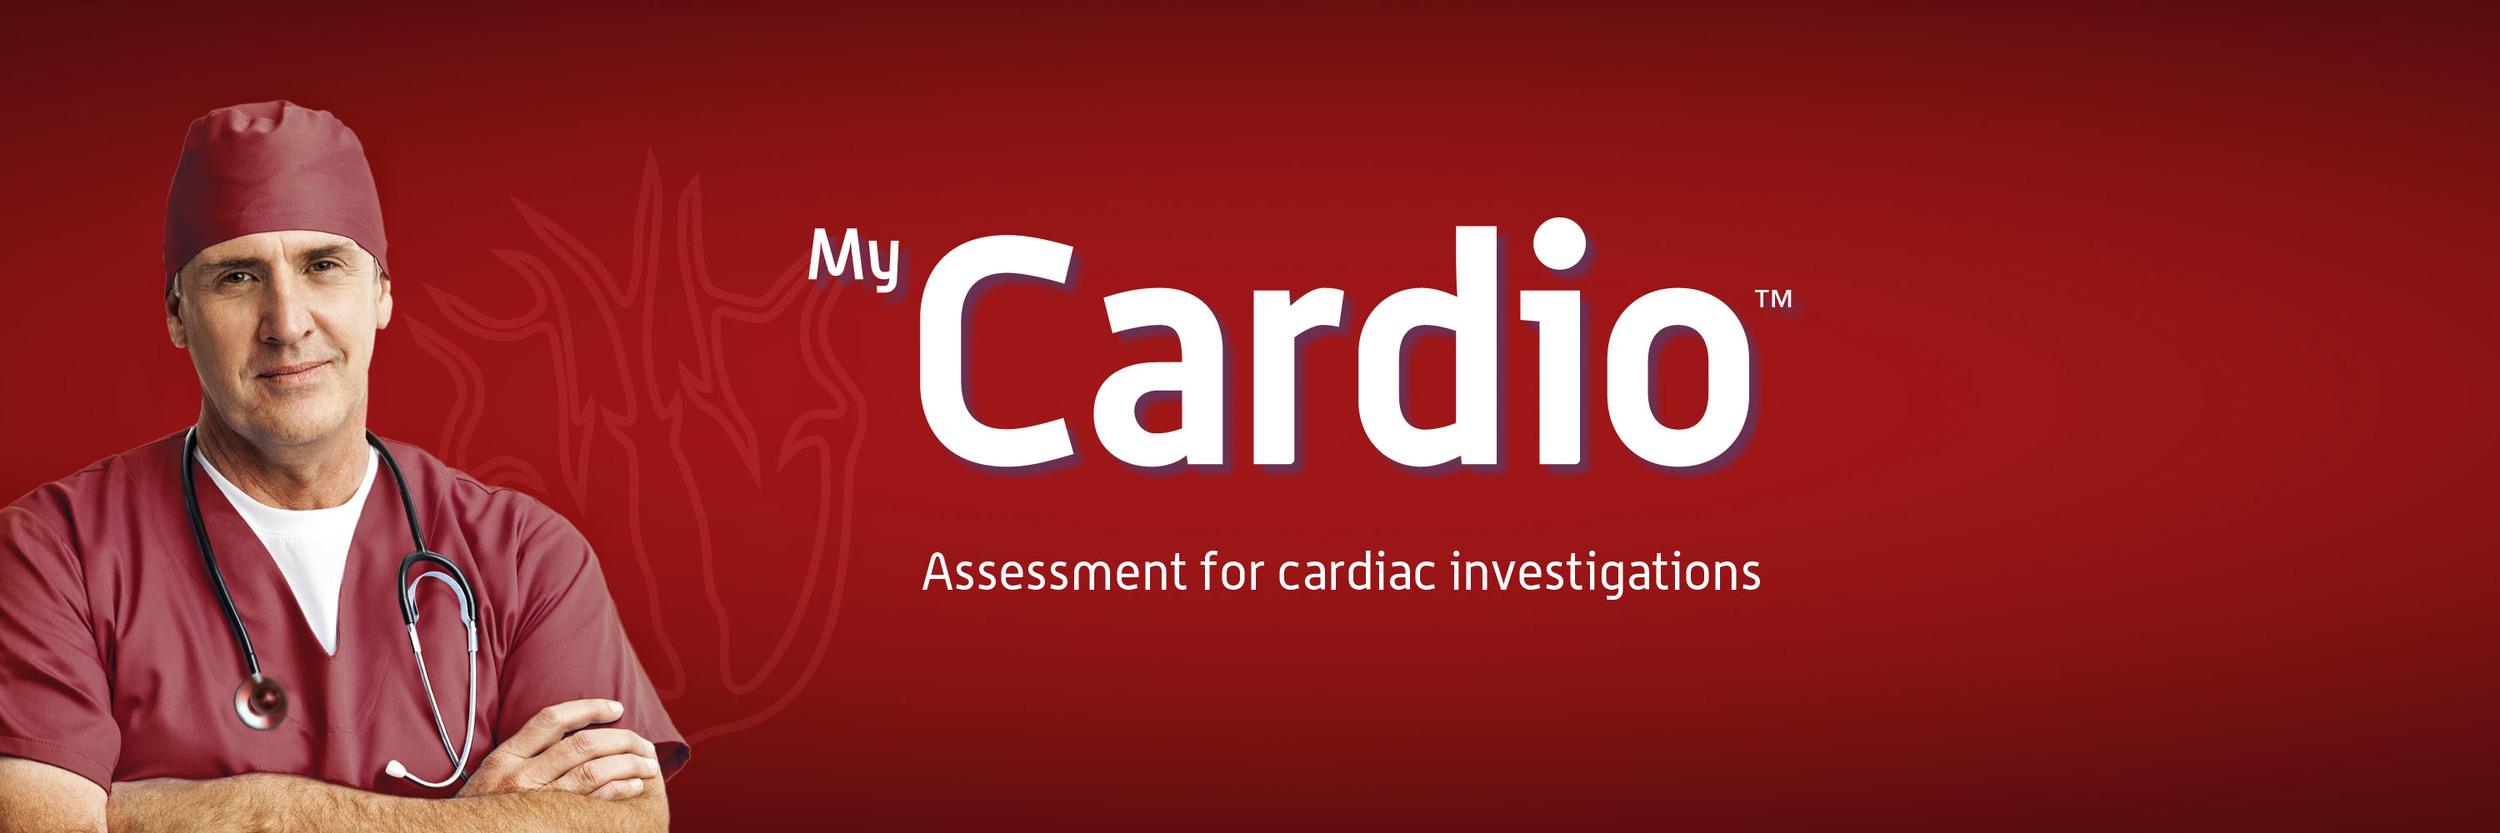 MyCardio banner, assessment for cardiac procedures